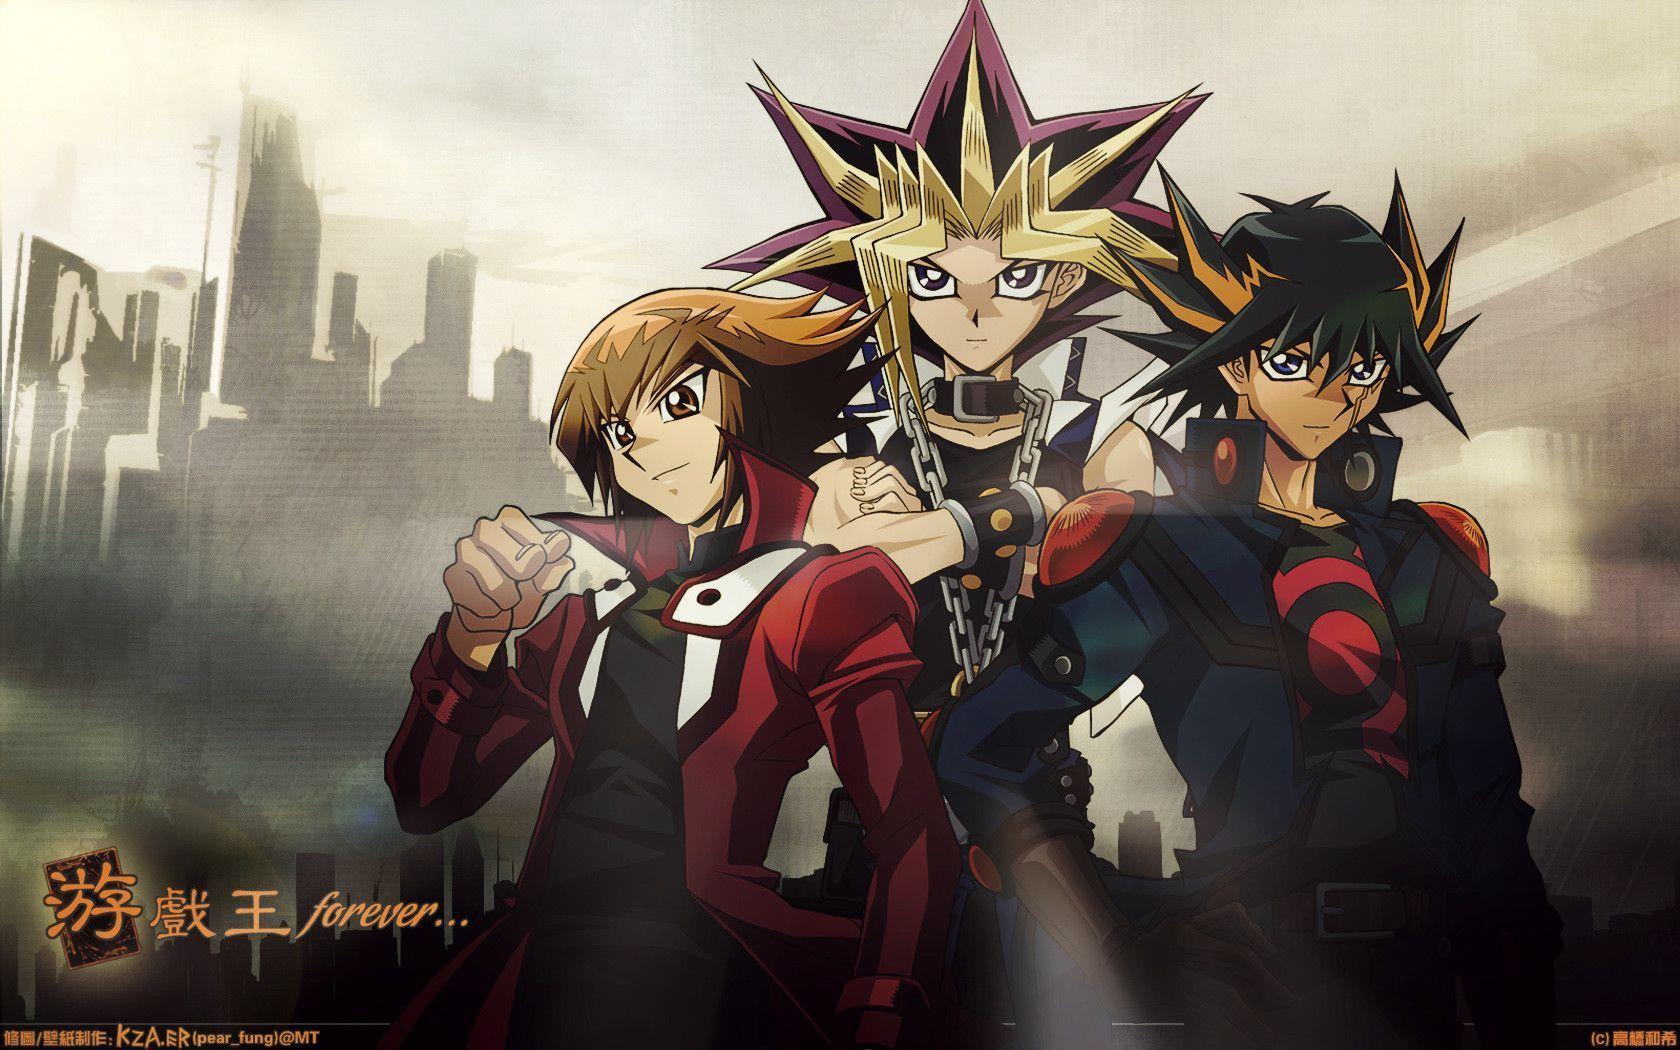 Yugioh Wallpaper Hd Jpg Yugioh Anime Anime Kingdom